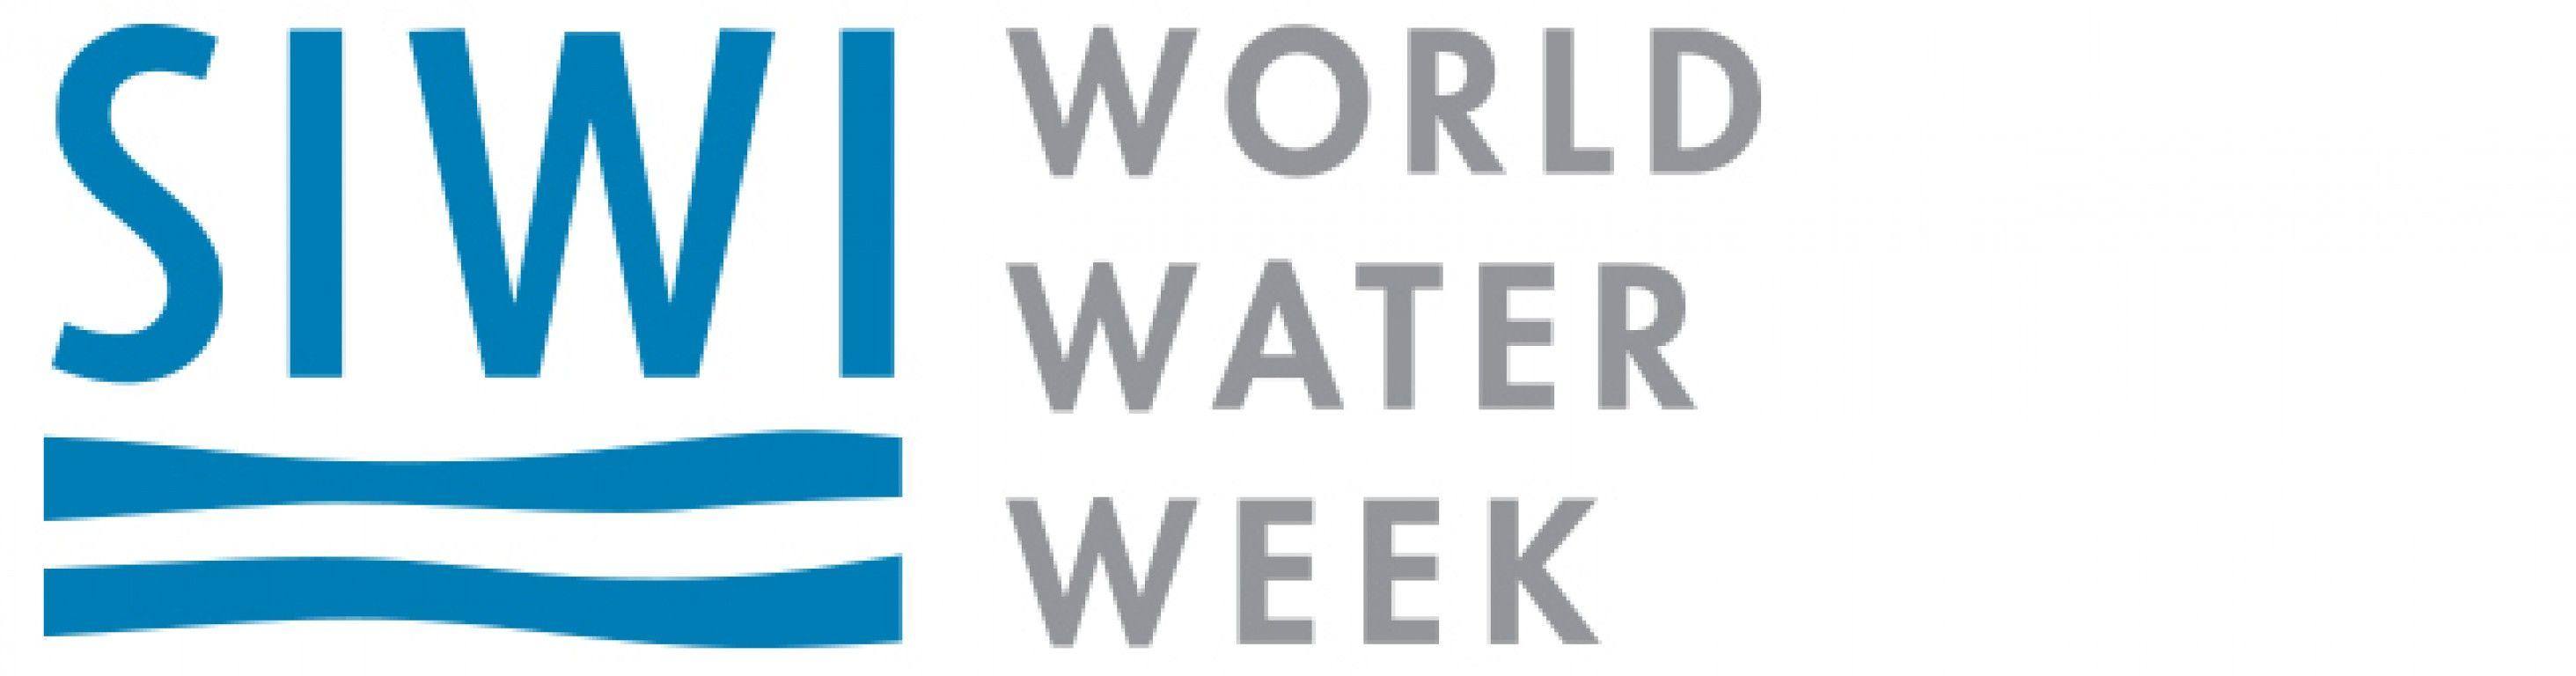 Semana Mundial del Agua (Estocolmo 2019)